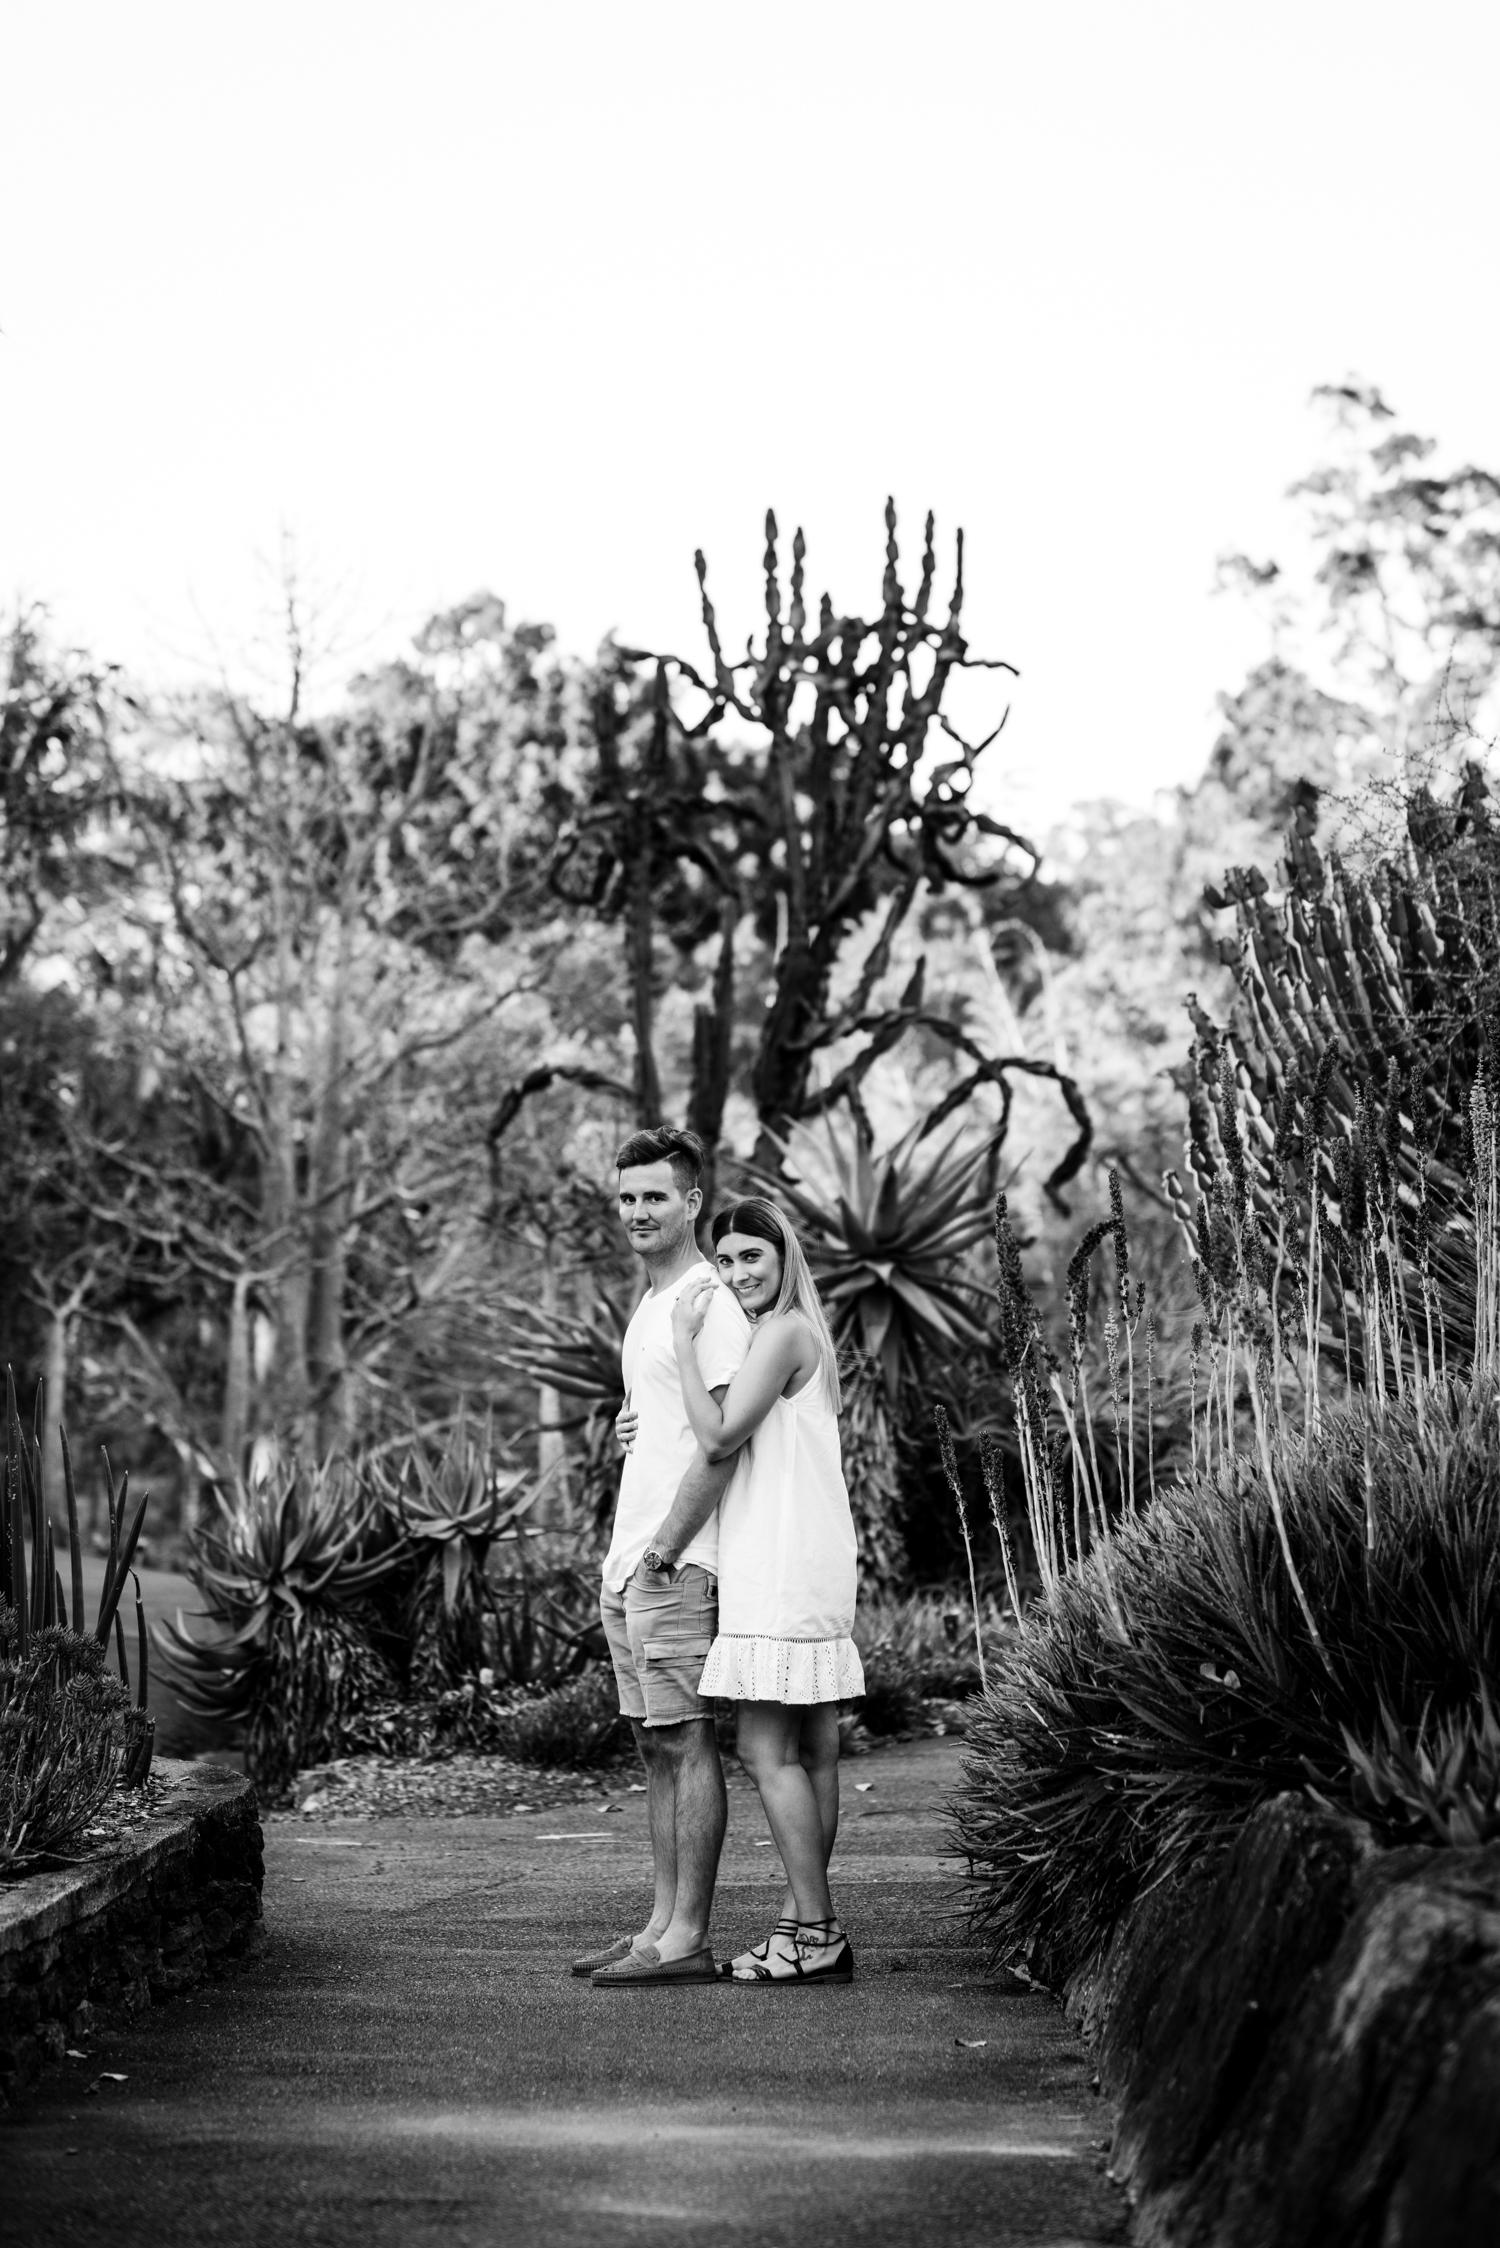 Brisbane Wedding Photographer | Engagement-Elopement Photography Botanical Gardens-20.jpg